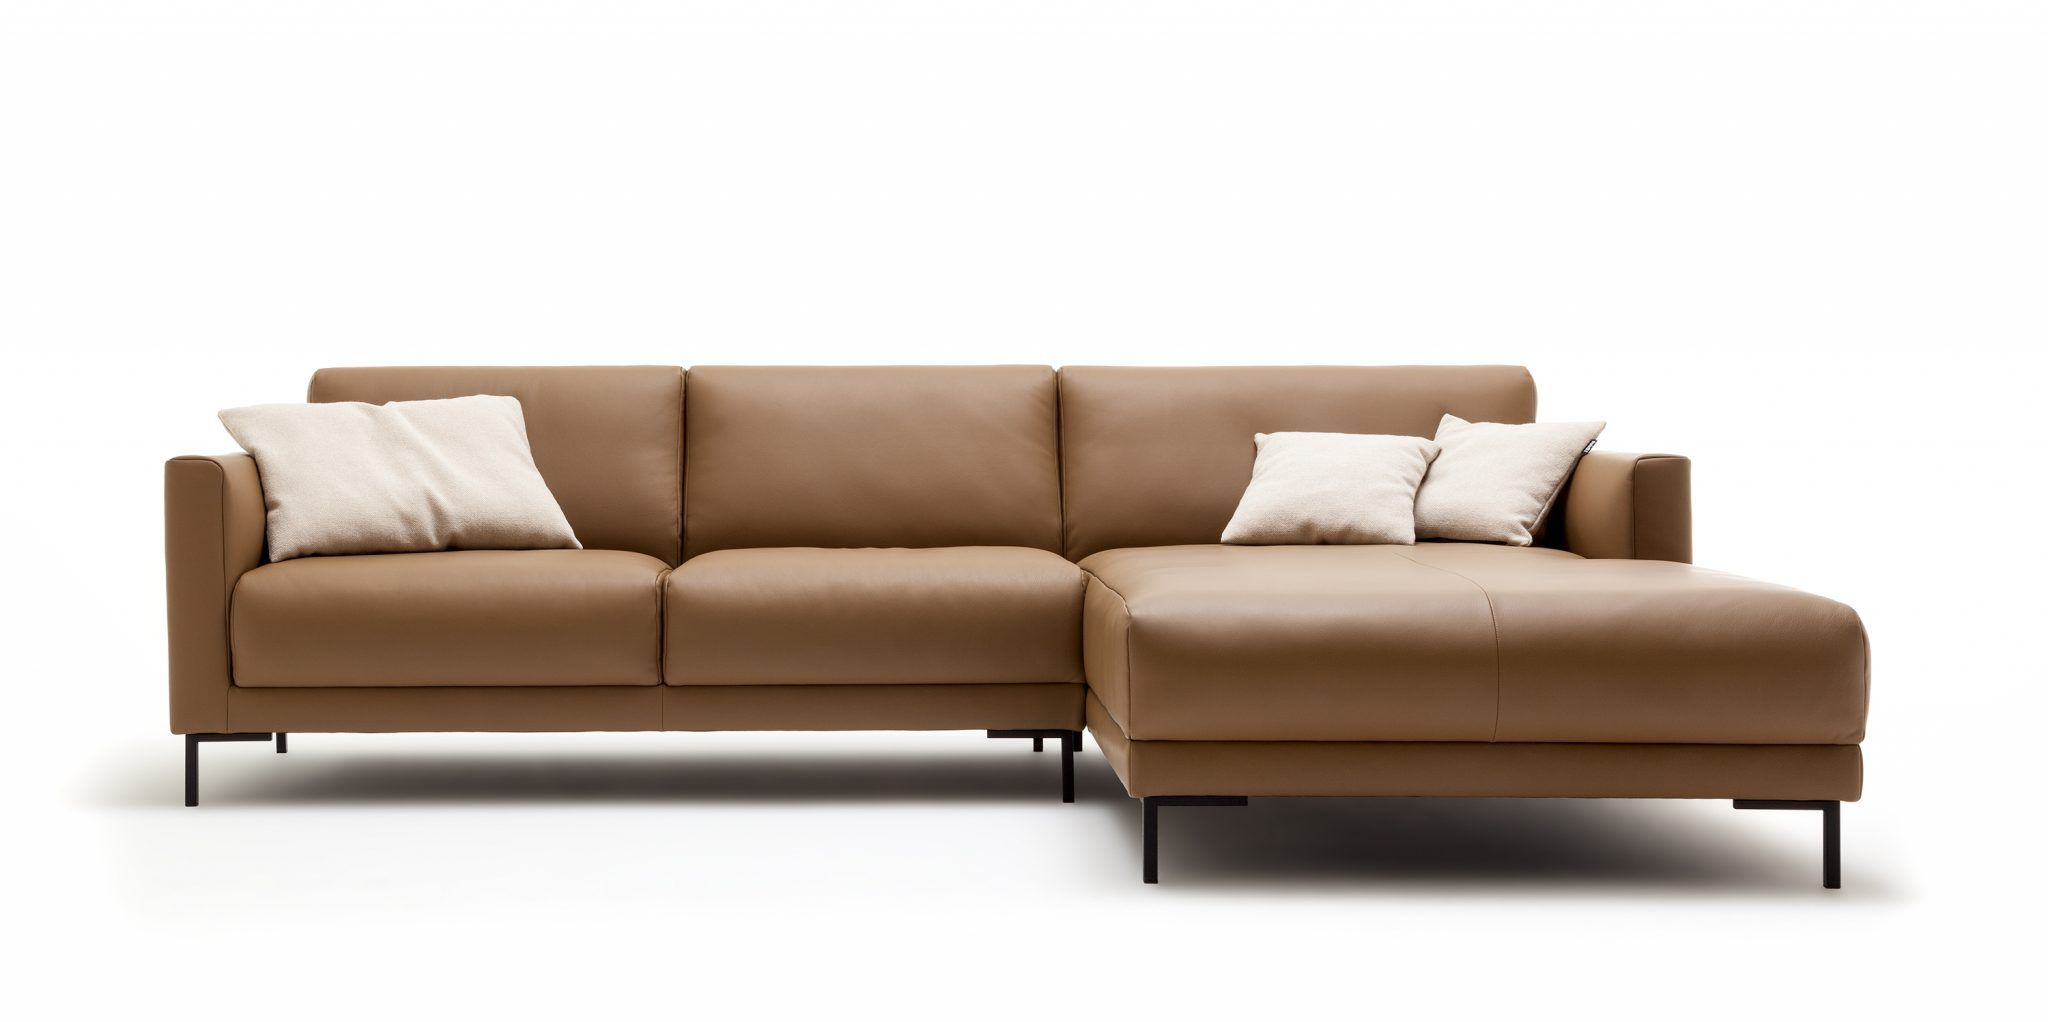 Freistil Exil Wohnmagazin Wohnzimmer Sofa Sofa Design Sofa